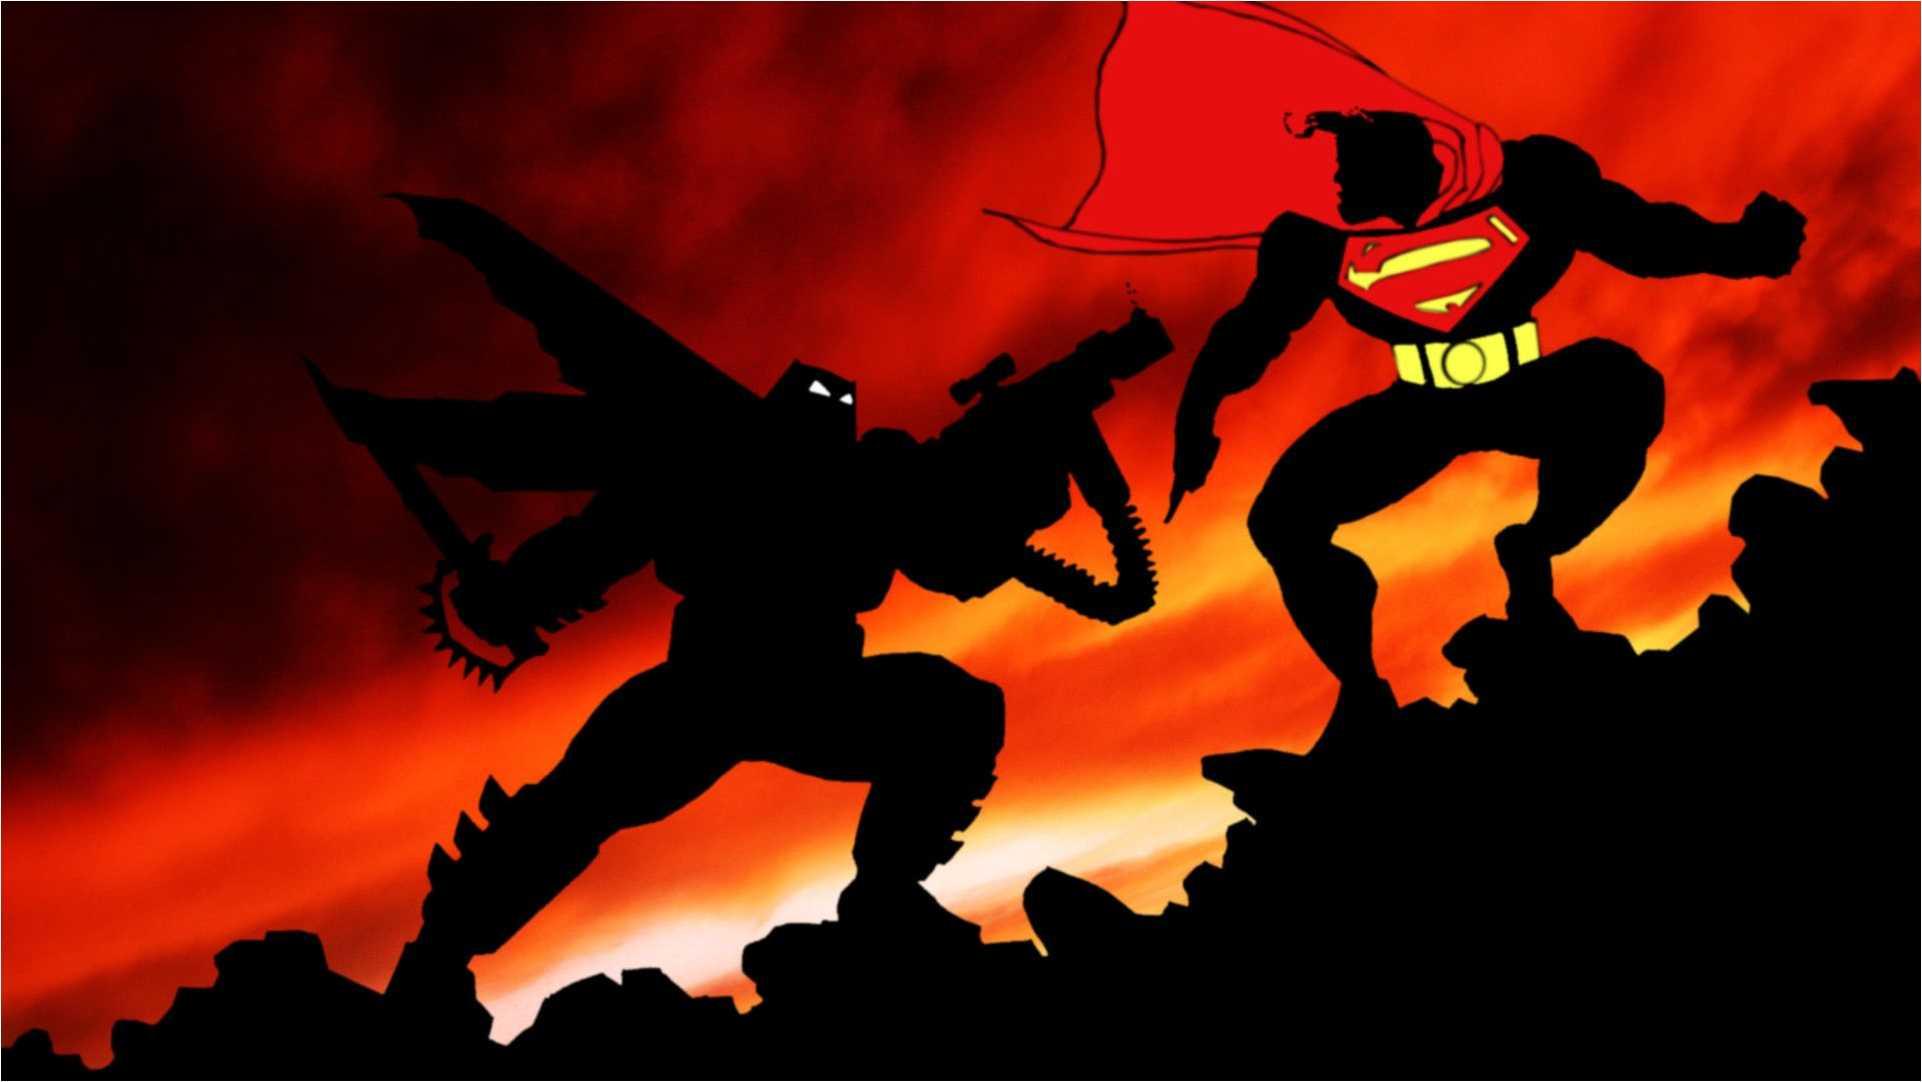 Dark Knight Returns Wallpapers Wallpaper Cave